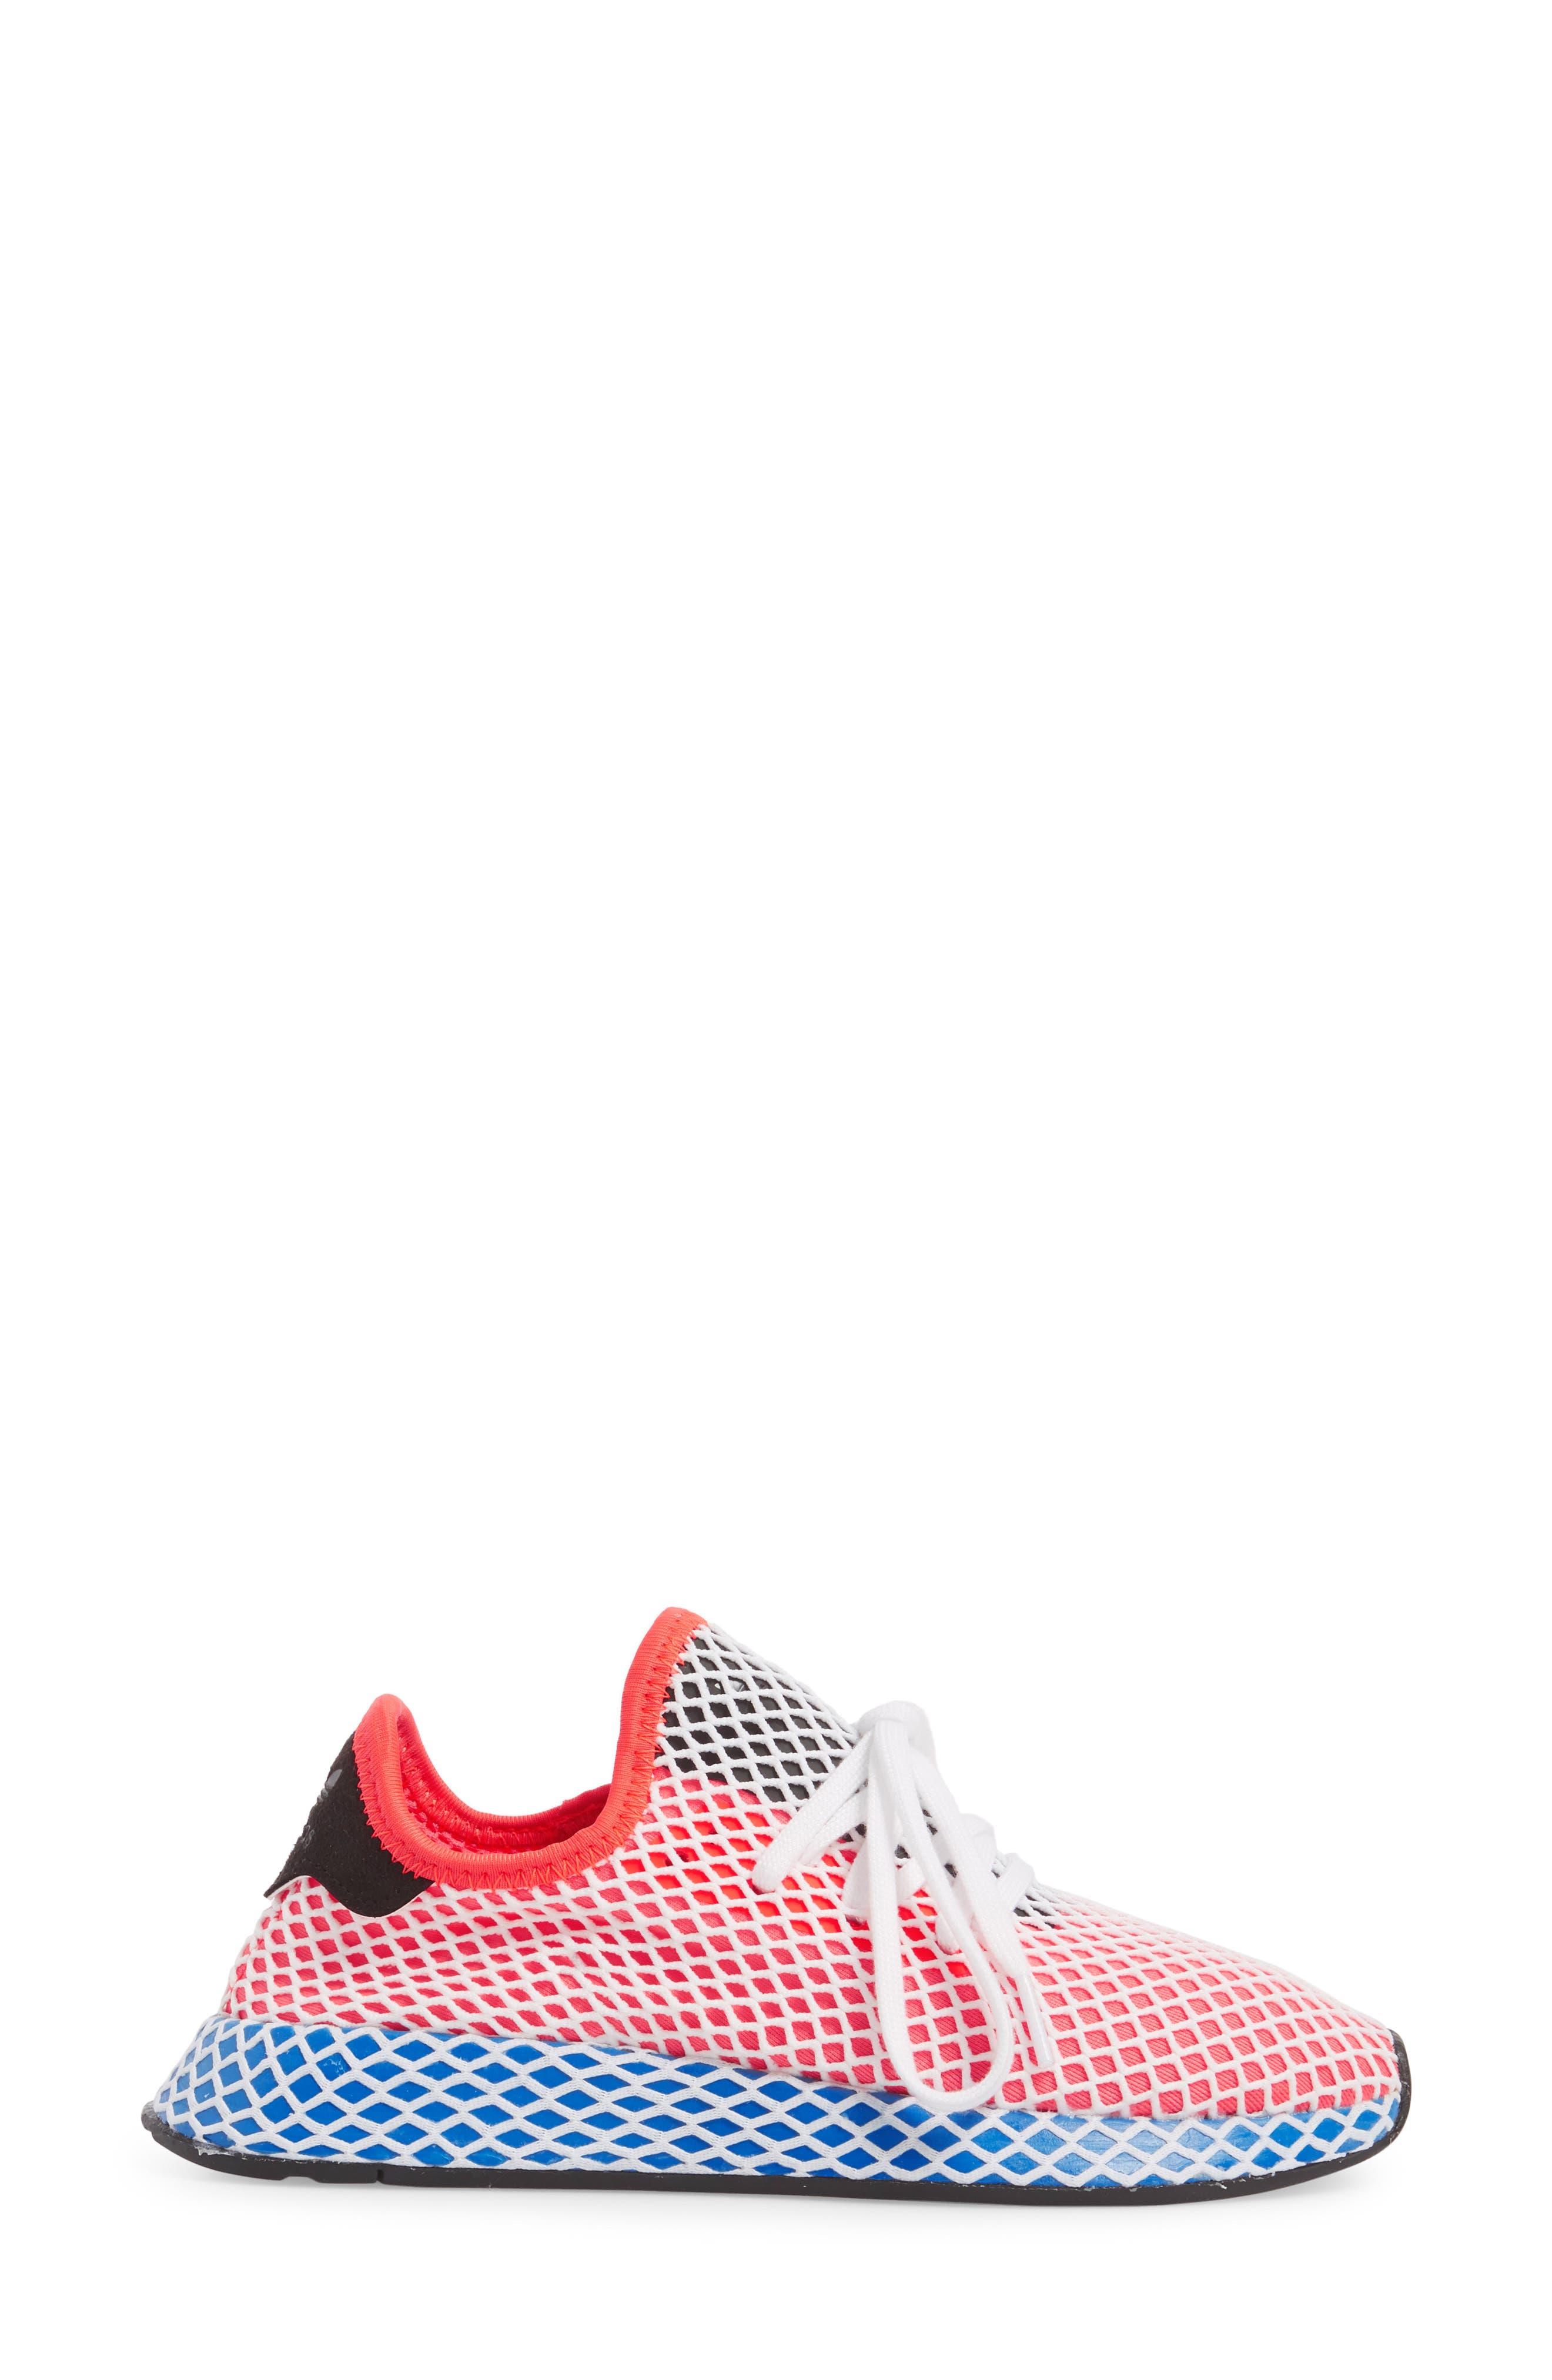 Deerupt Runner Sneaker,                             Alternate thumbnail 3, color,                             600